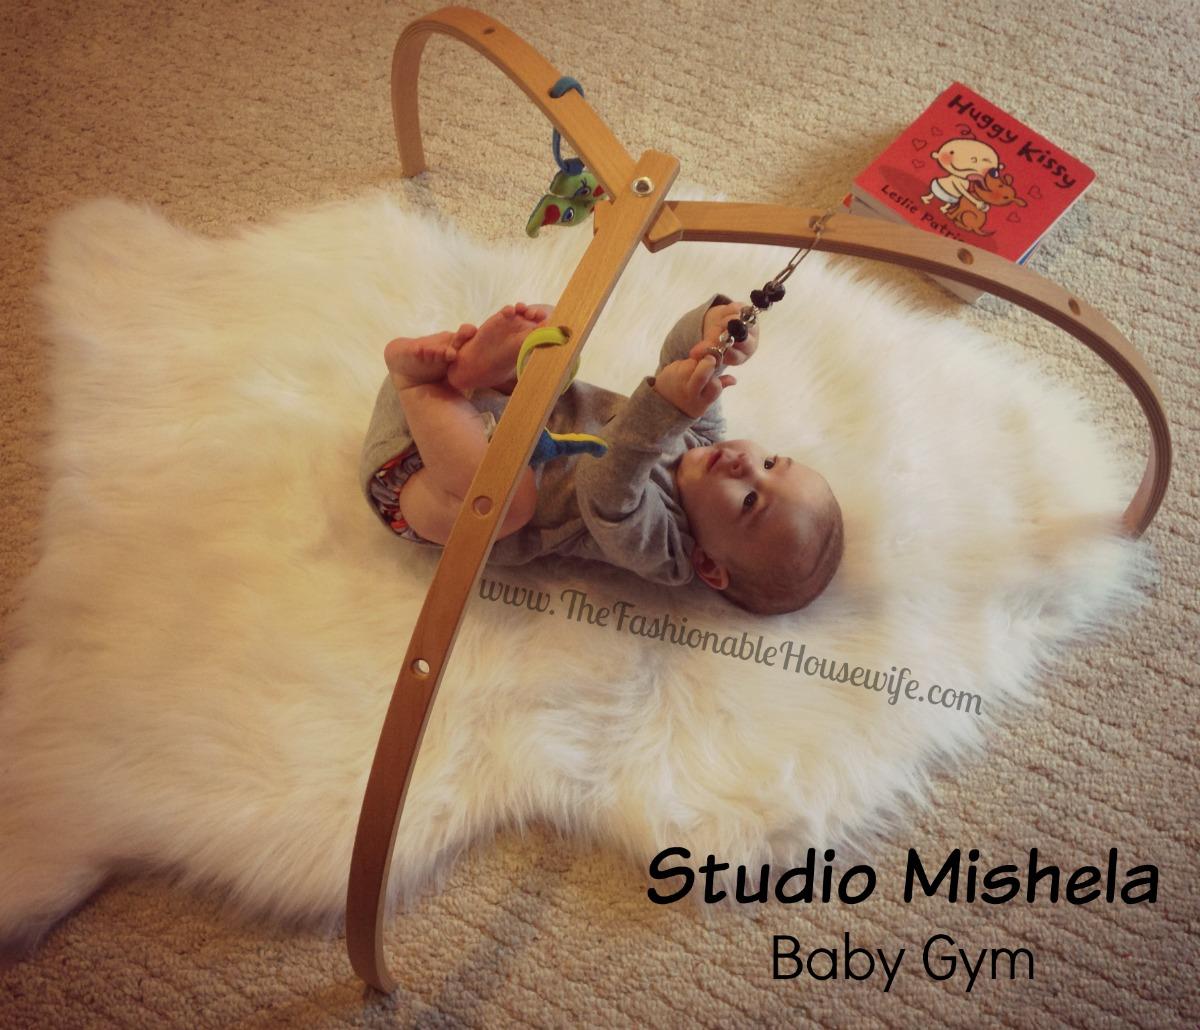 studio mishela baby gym1